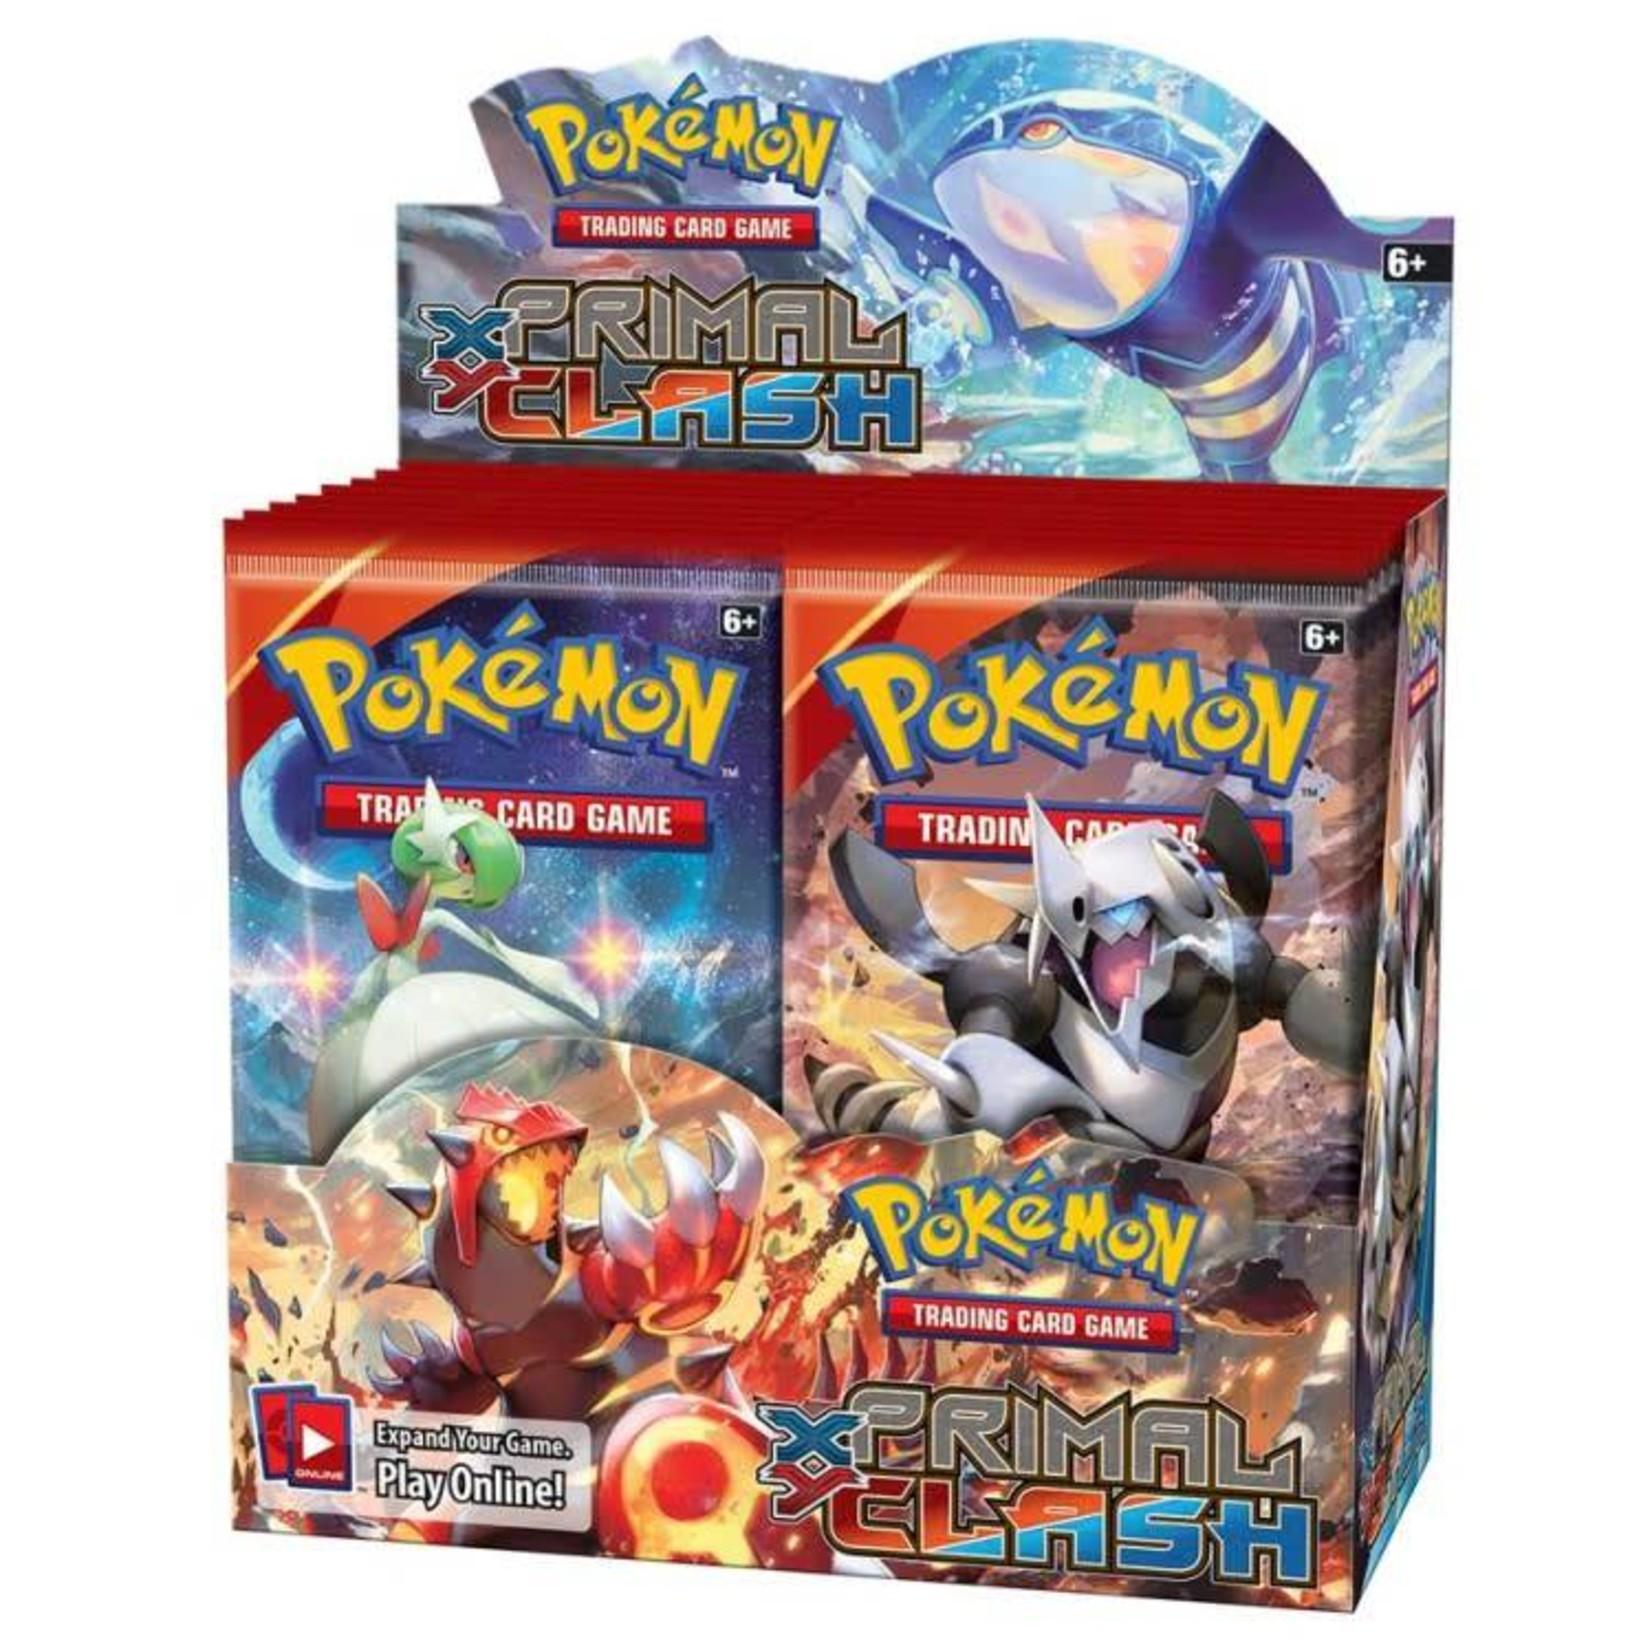 Pokemon International Pokemon Trading Card Game: Primal Clash Booster Box